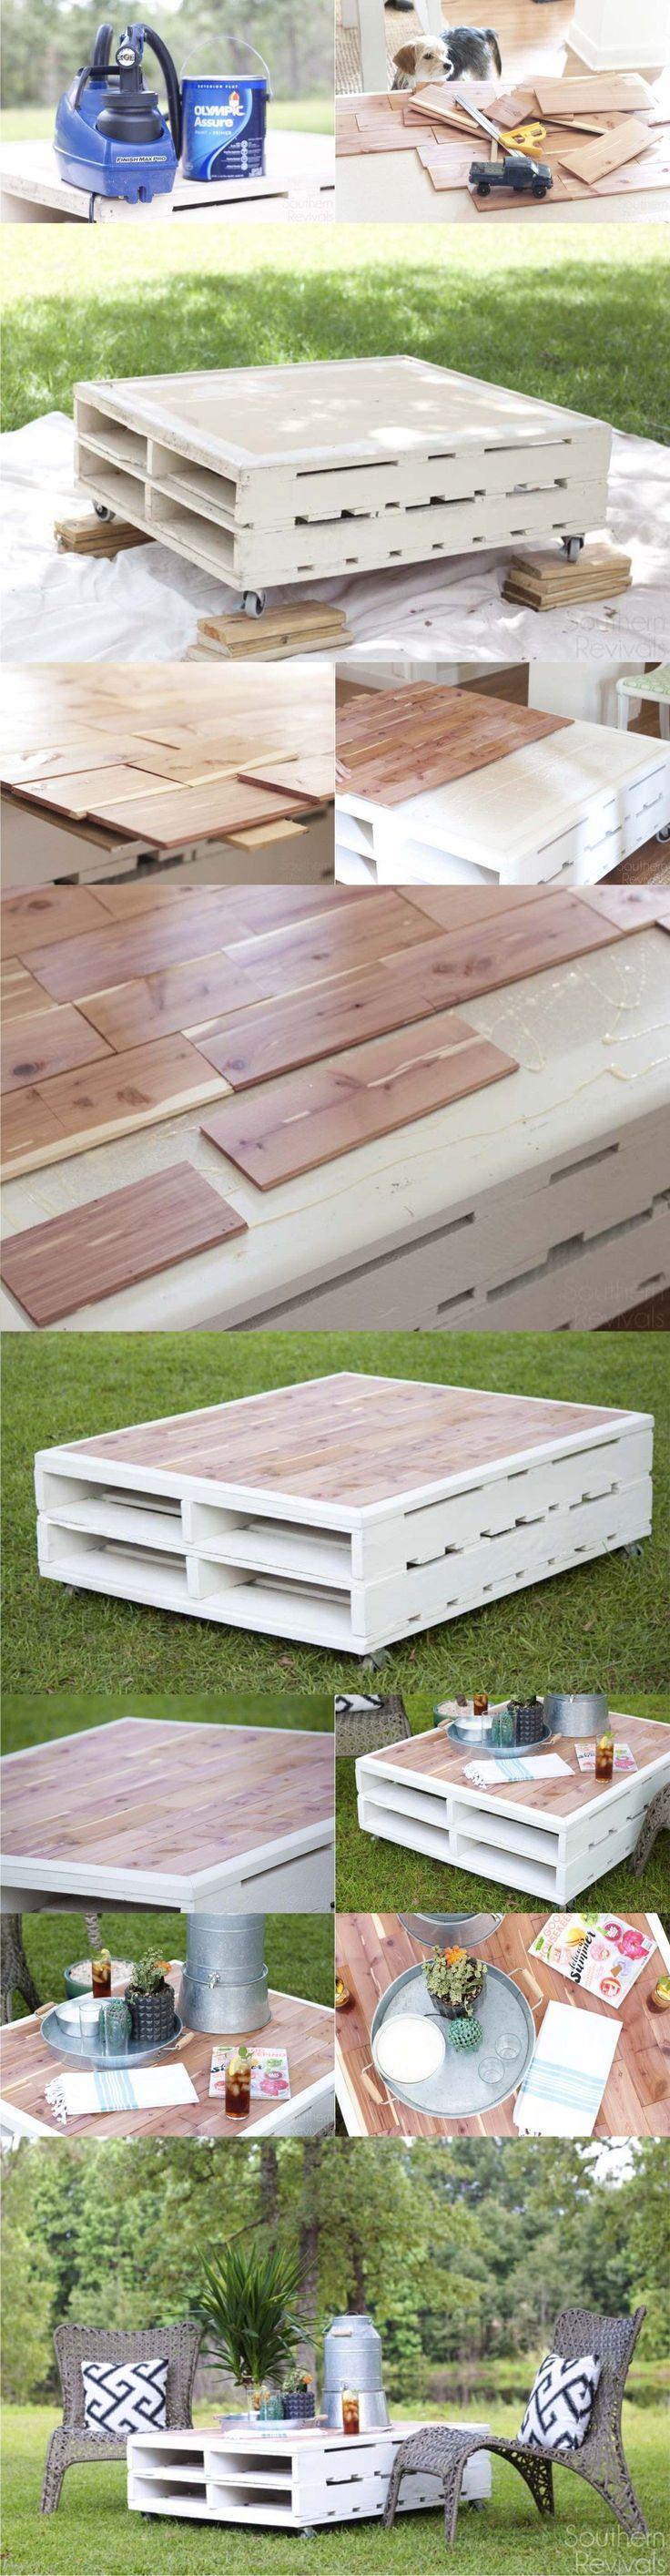 M s de 25 ideas fant sticas sobre mesas hechas con palets - Cosas hechas de palets ...